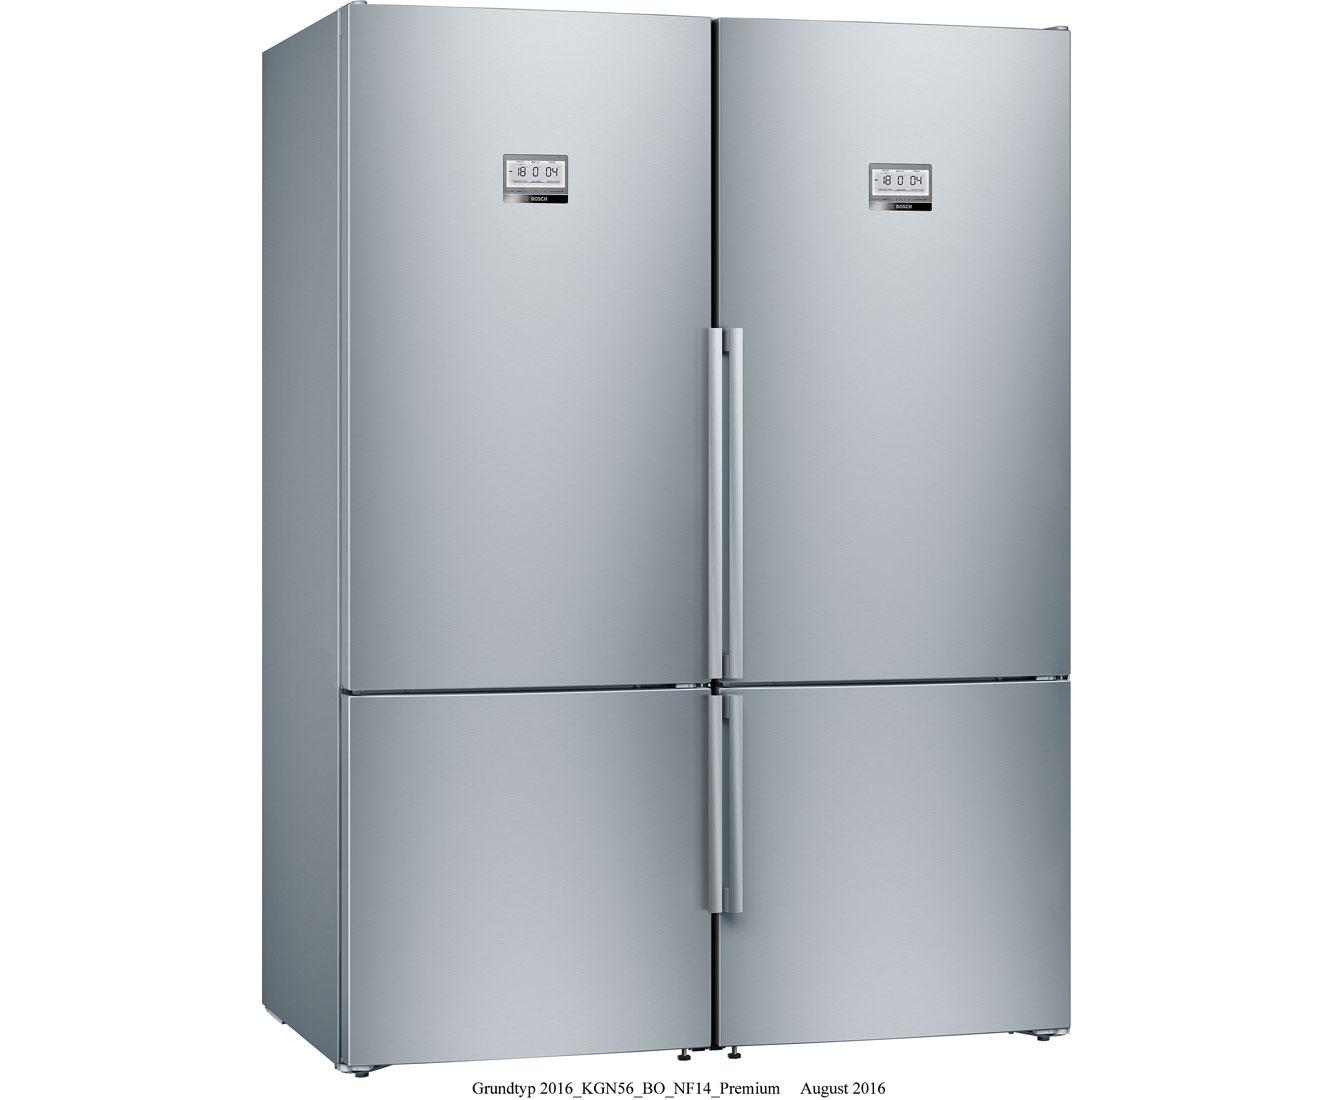 Side By Side Kühlschrank In Ecke : Side by side kühlschrank preisvergleich u die besten angebote